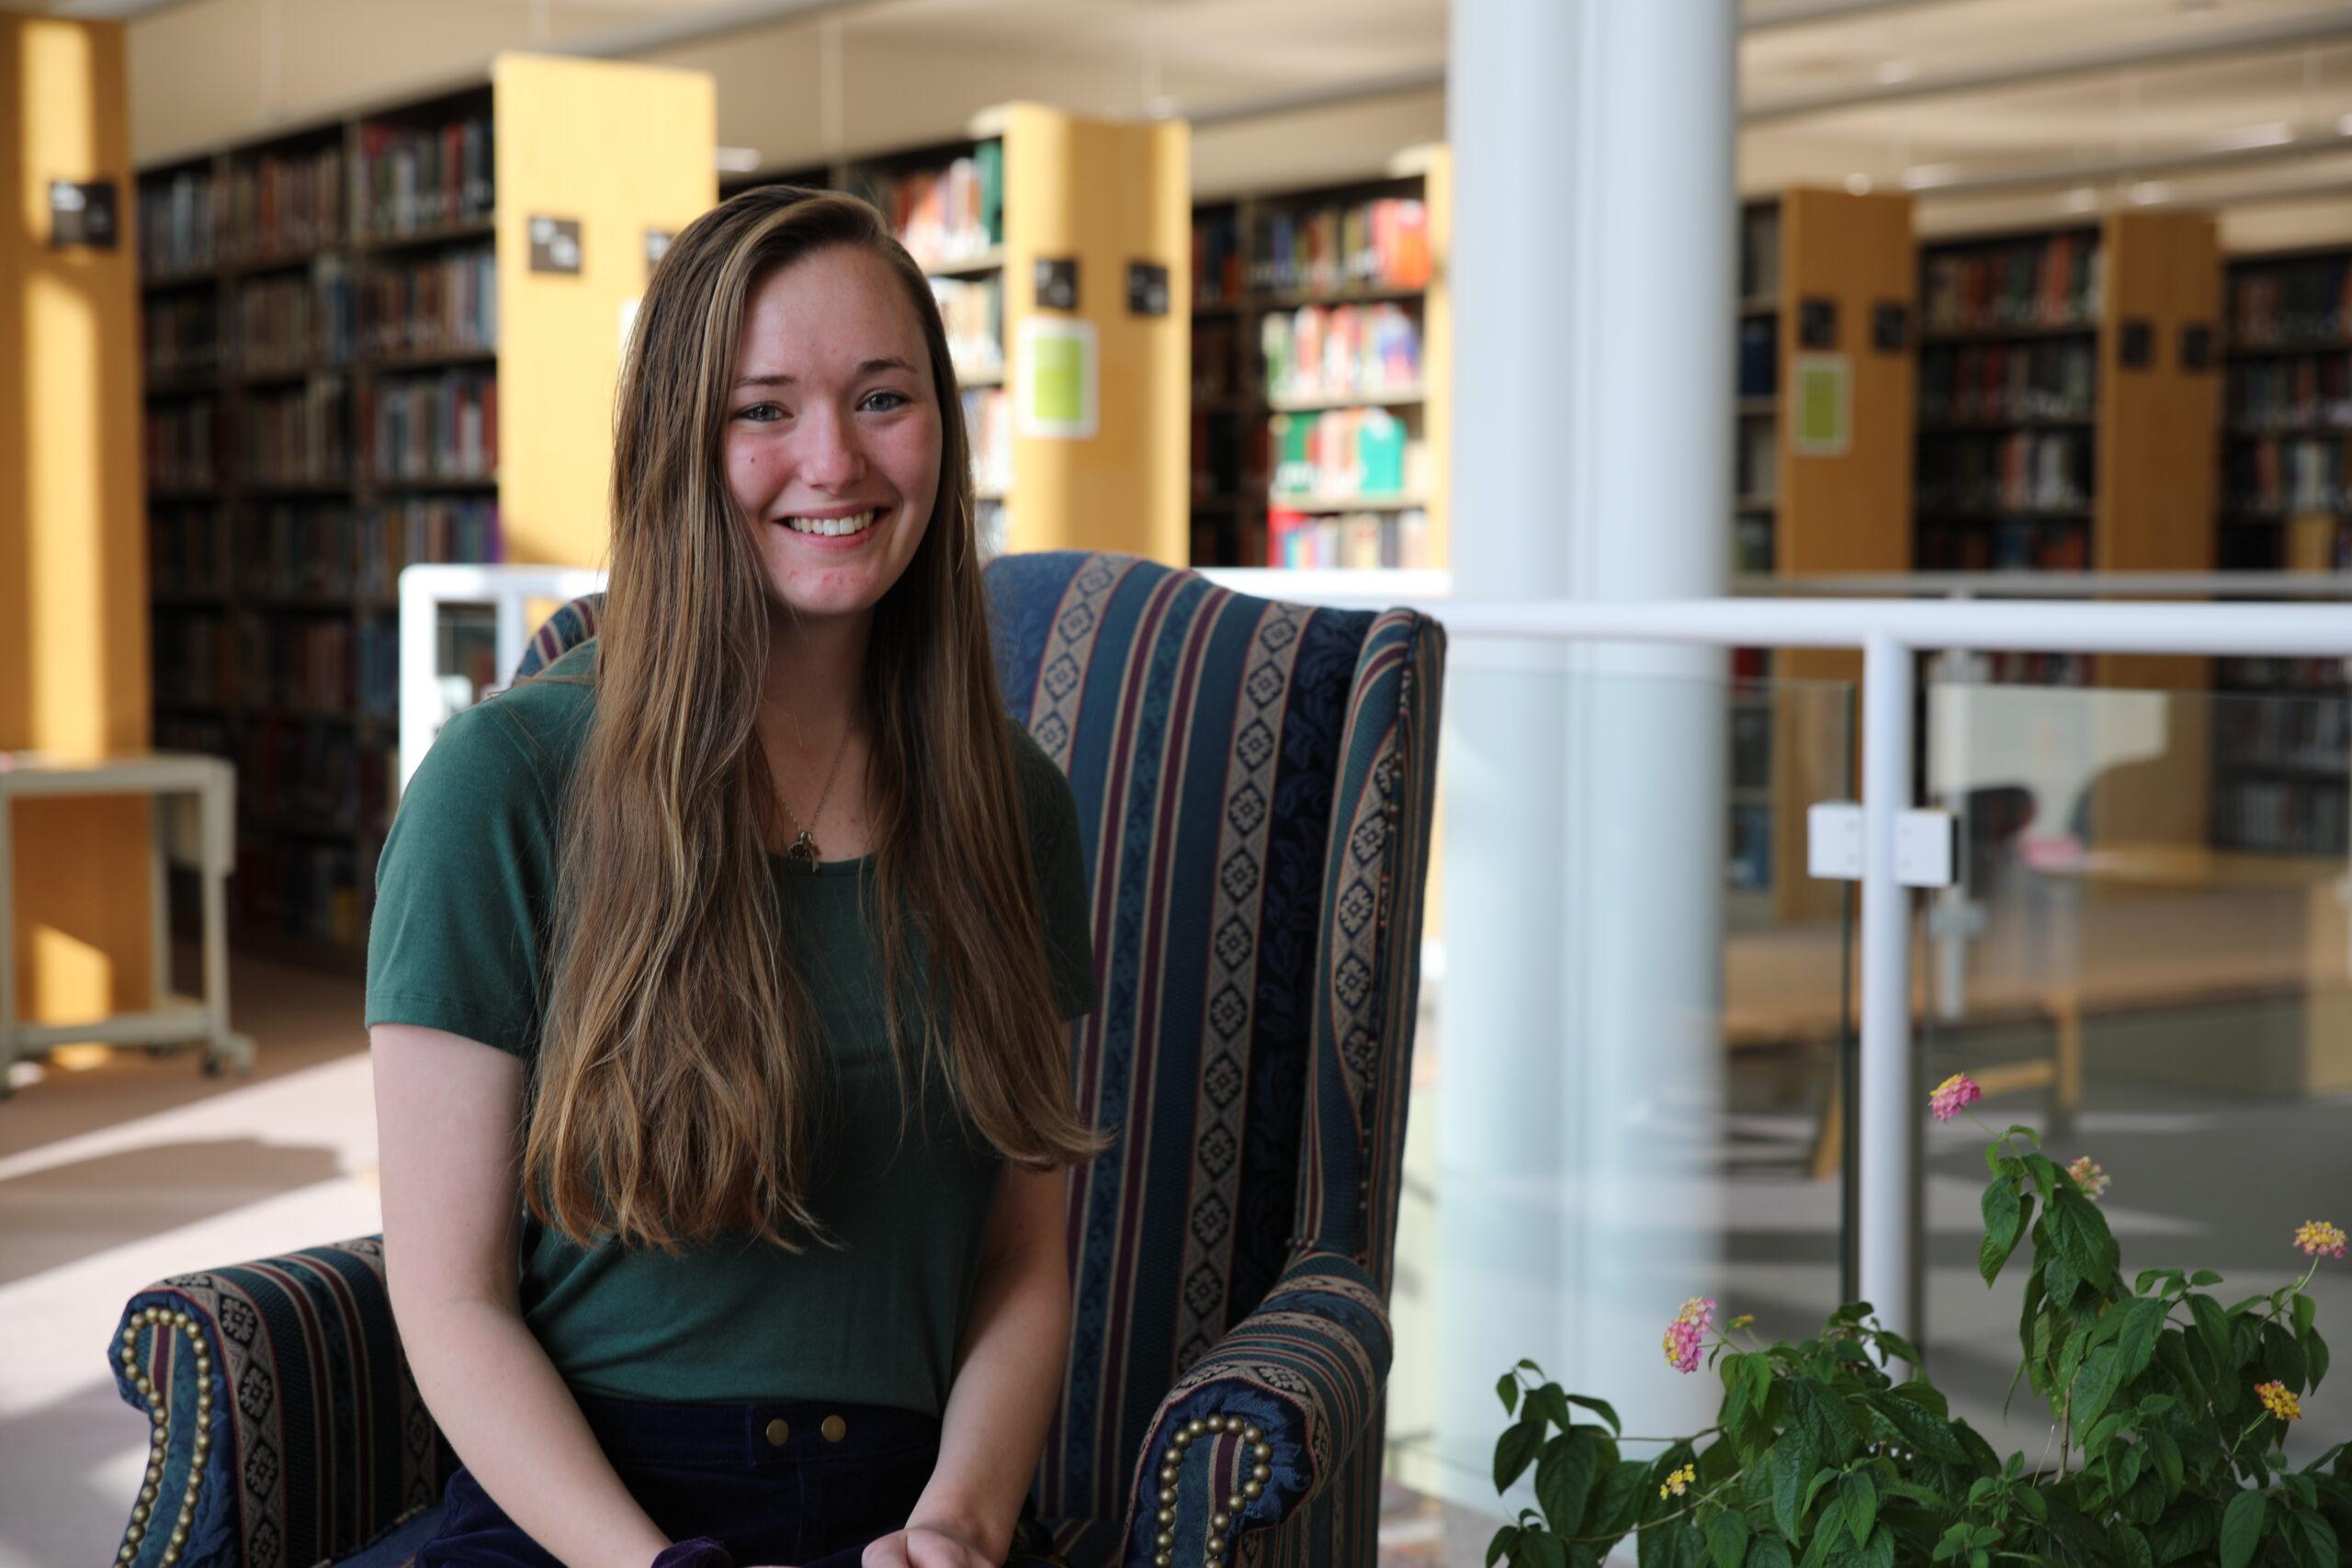 Clarke University education student, Jenna Weber, talking about landing a job